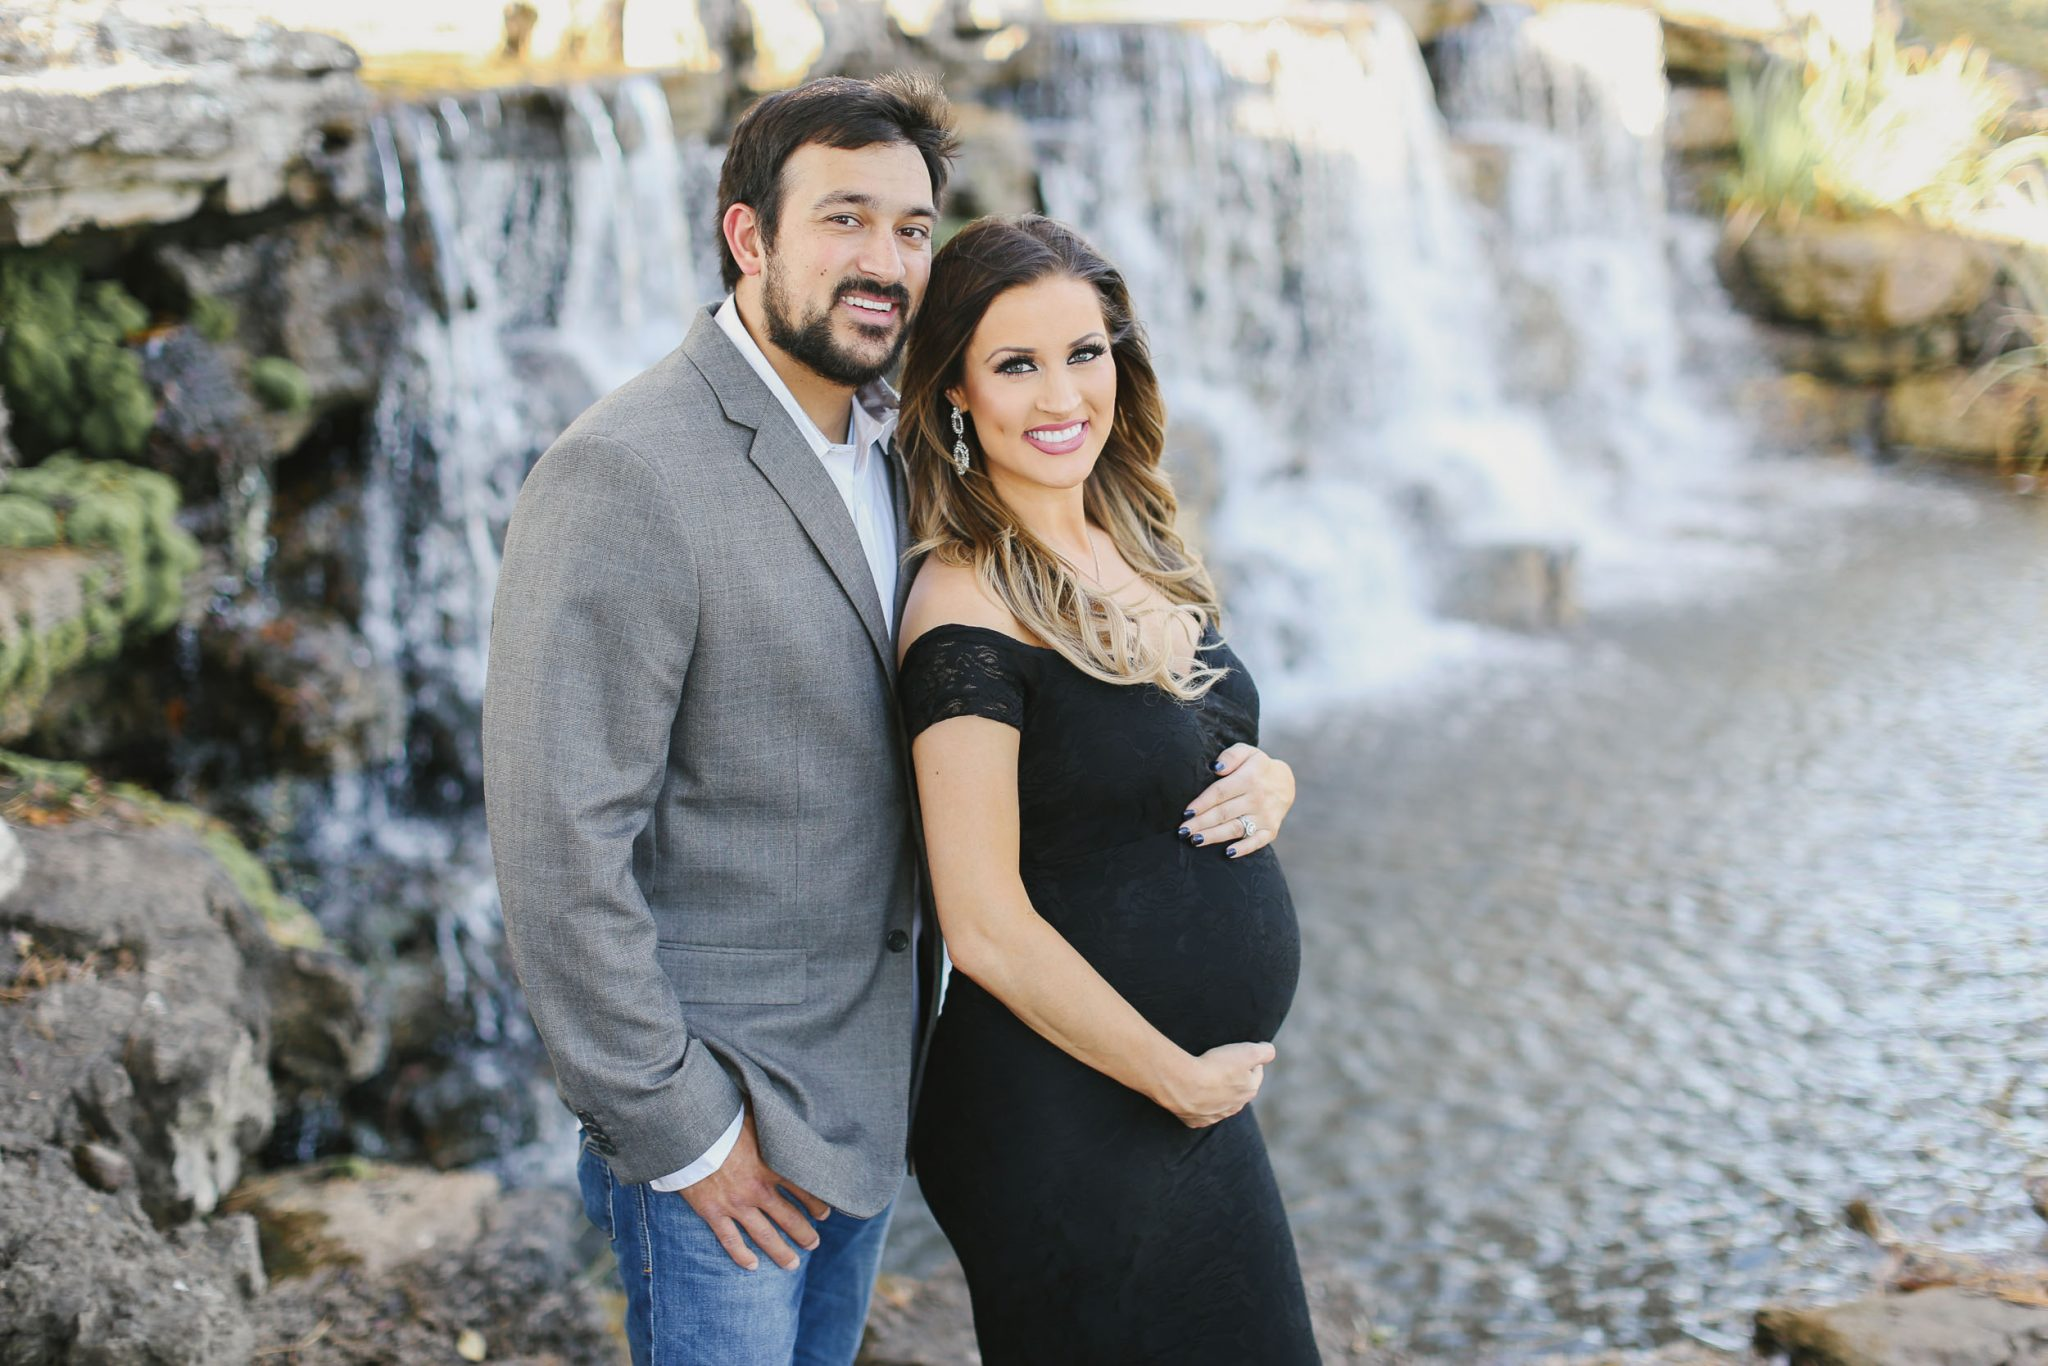 Mariah chris branson mo maternity photographer for 417 salon branson west